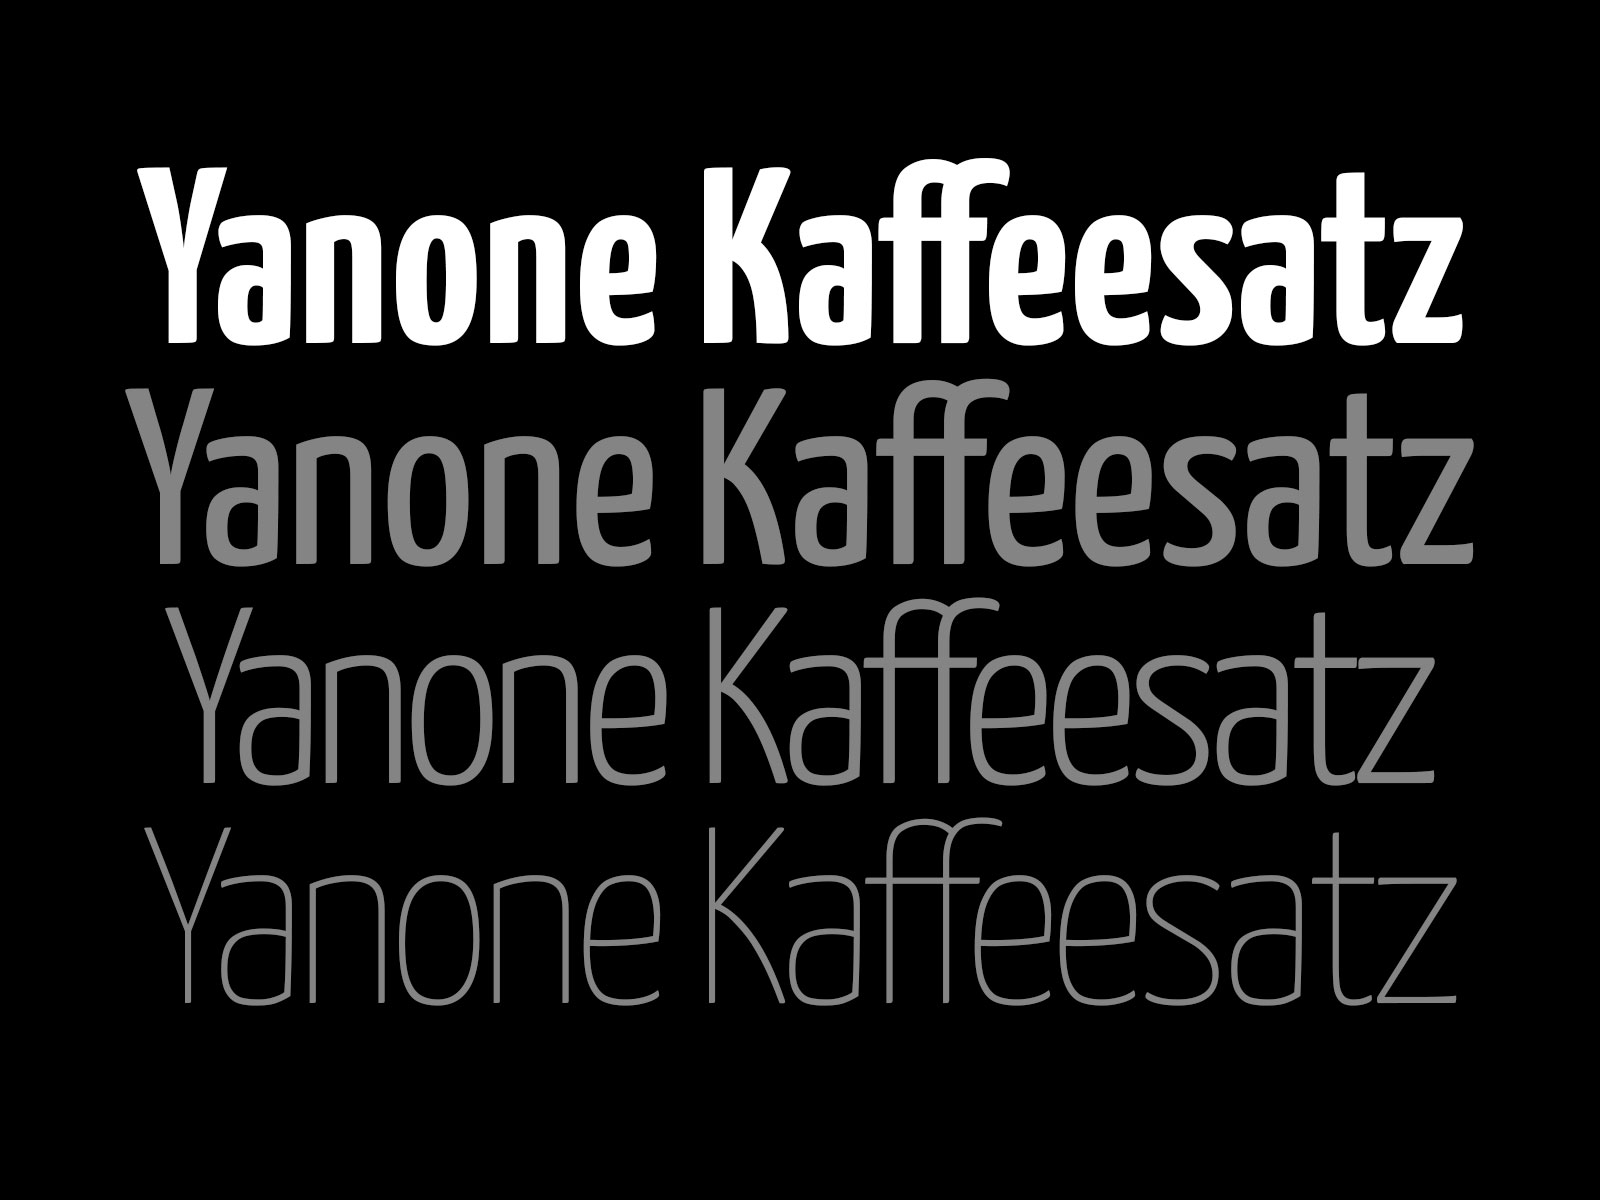 Yanone-Kaffeesatz-Free-Bold-Rounded-Sans-Serif-Font-Download